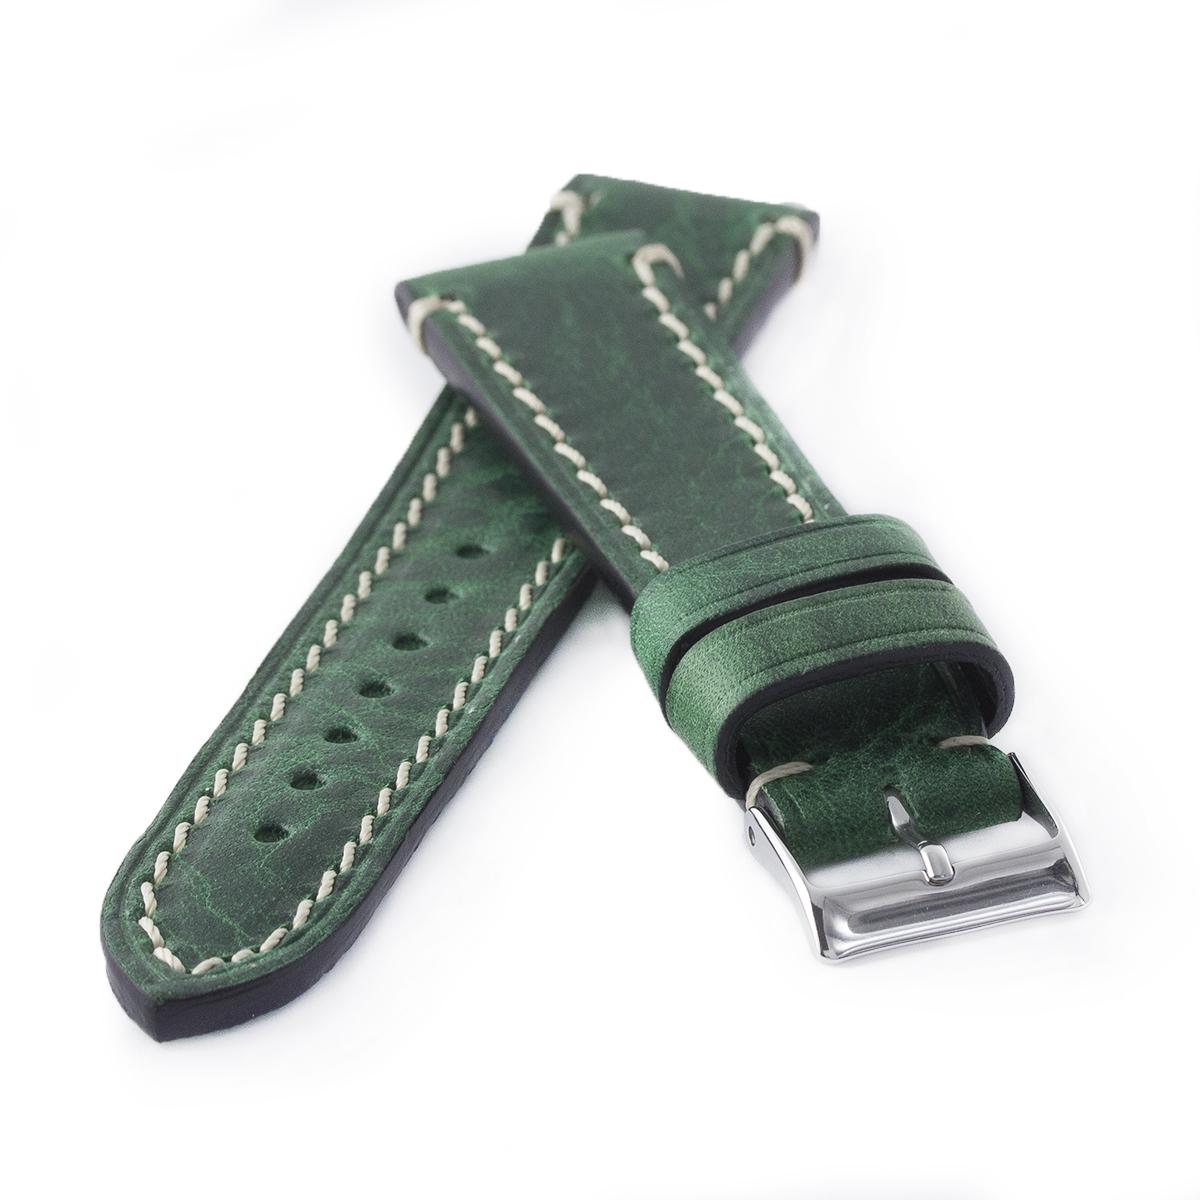 https://www.ebay.de/itm/Uhrenarmband-Kaufmann-Saddle-Vintage-stitched-dunkelgrun-Kalb-Leder-Armband-/263619328354